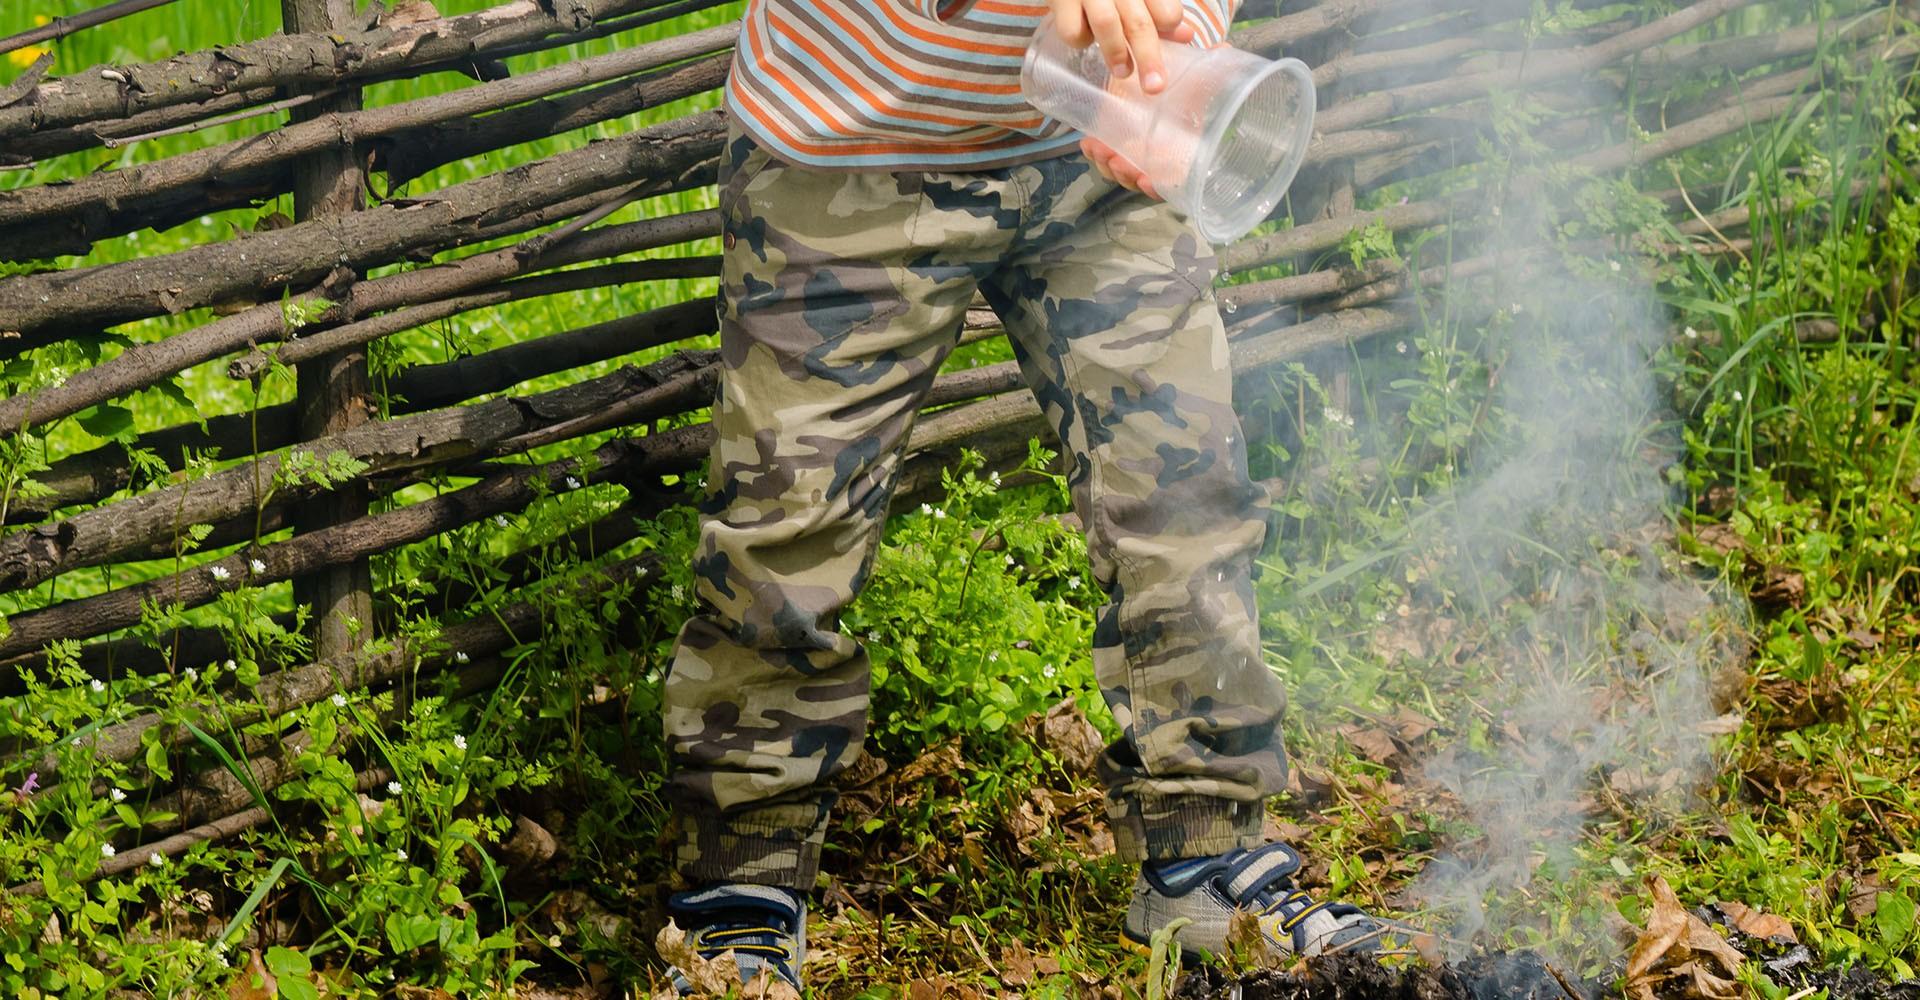 little boy putting out fire